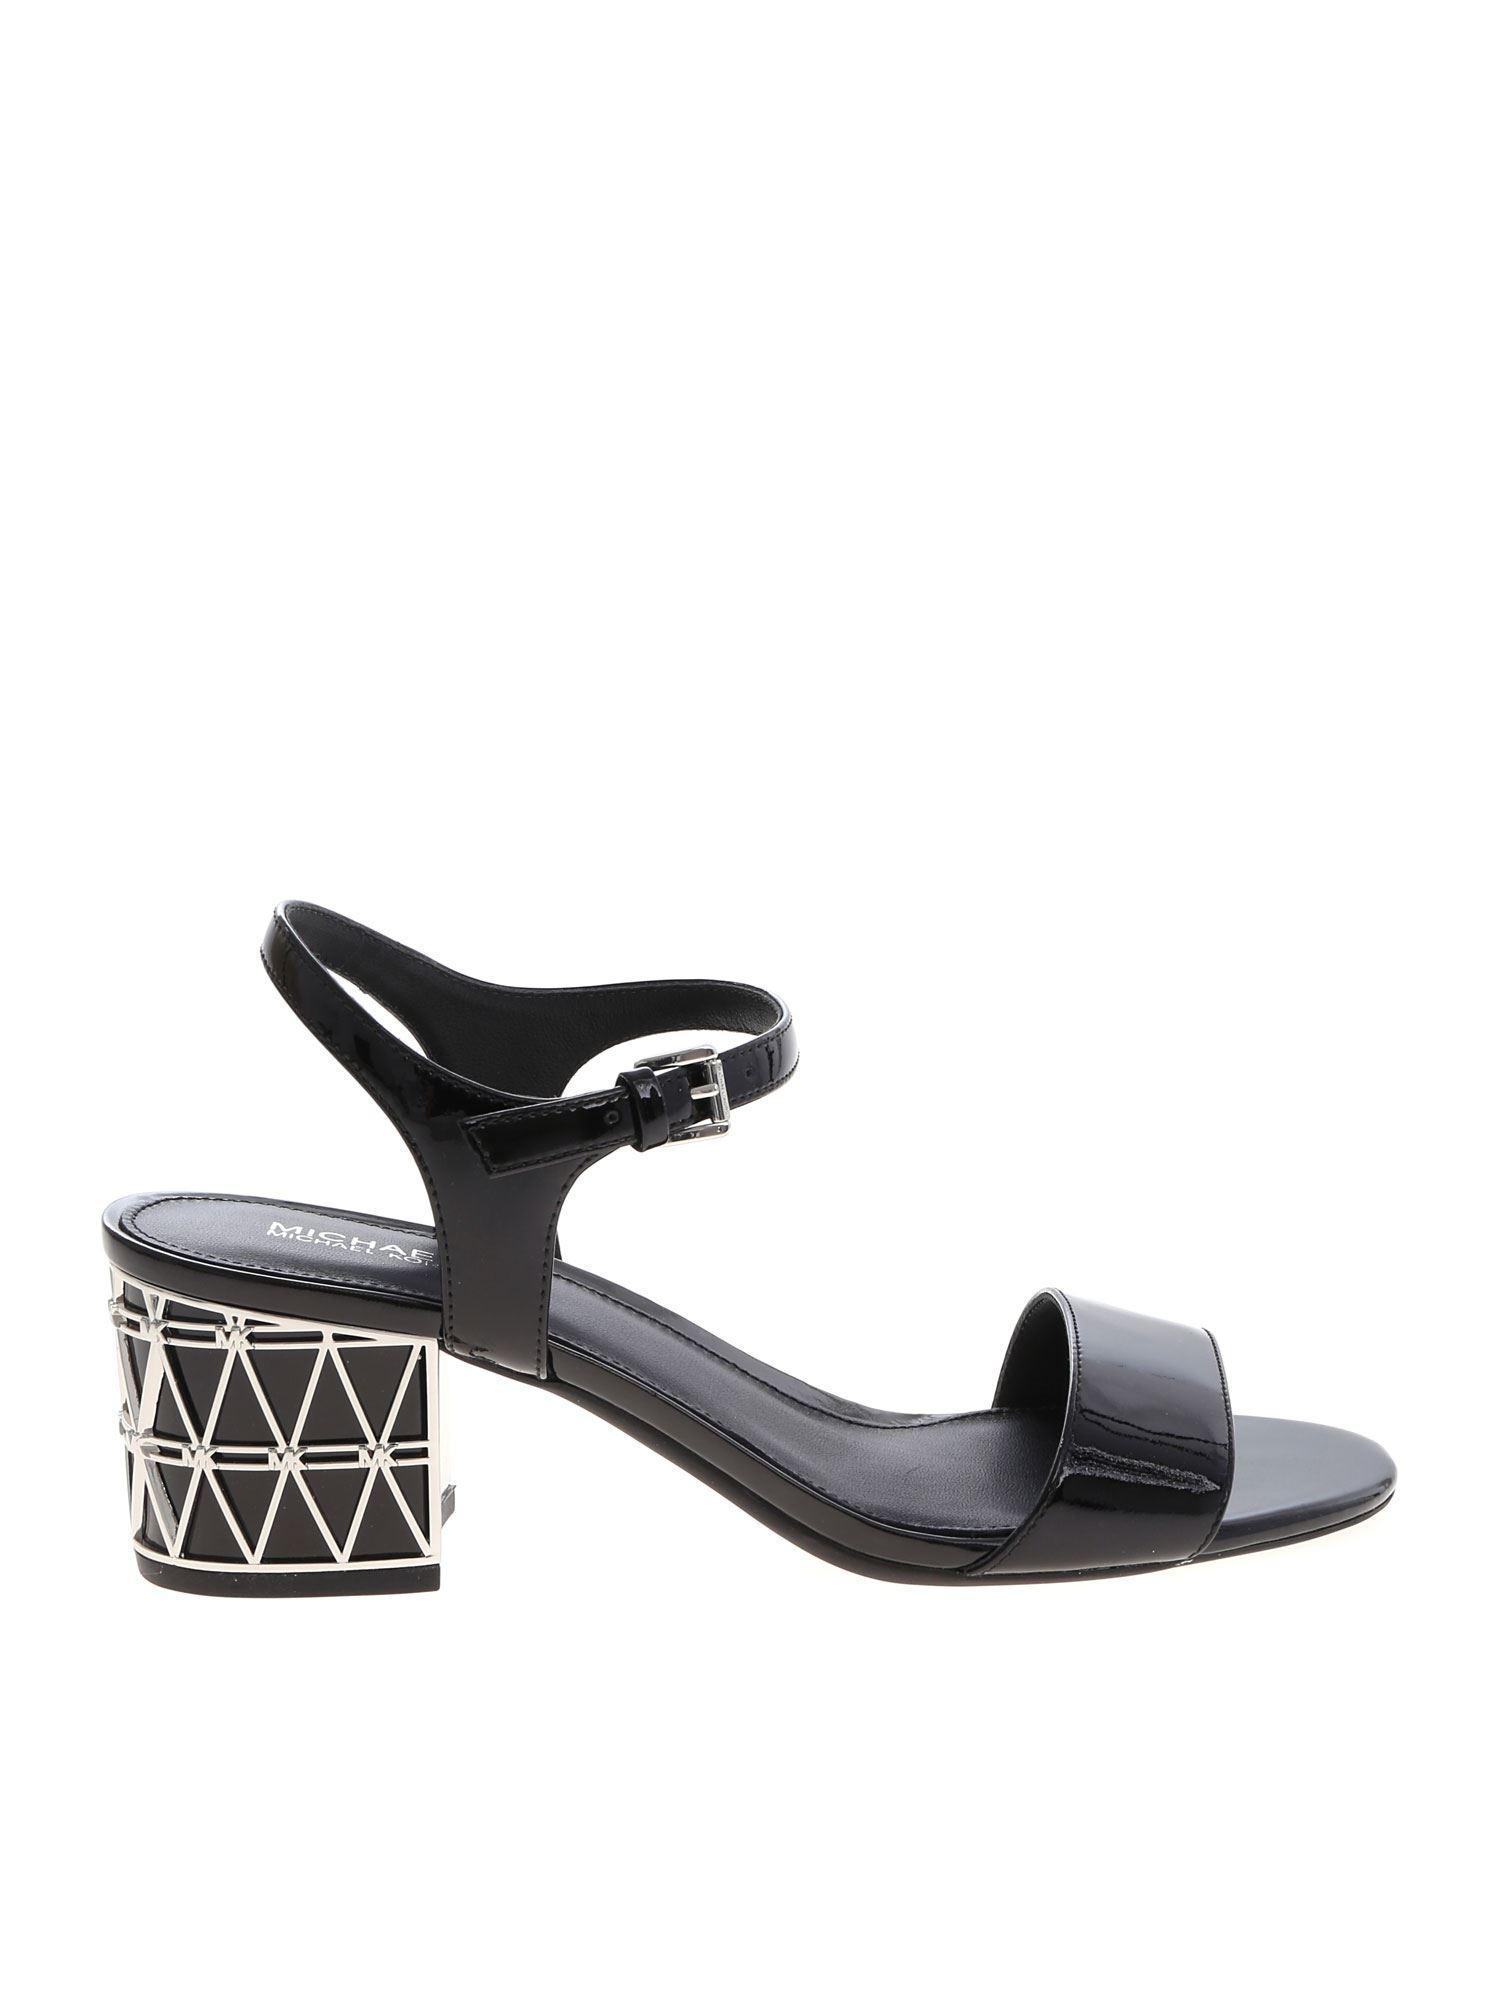 4ab5b63c1b8 Lyst - Michael Kors Beekman Sandals In Black in Black